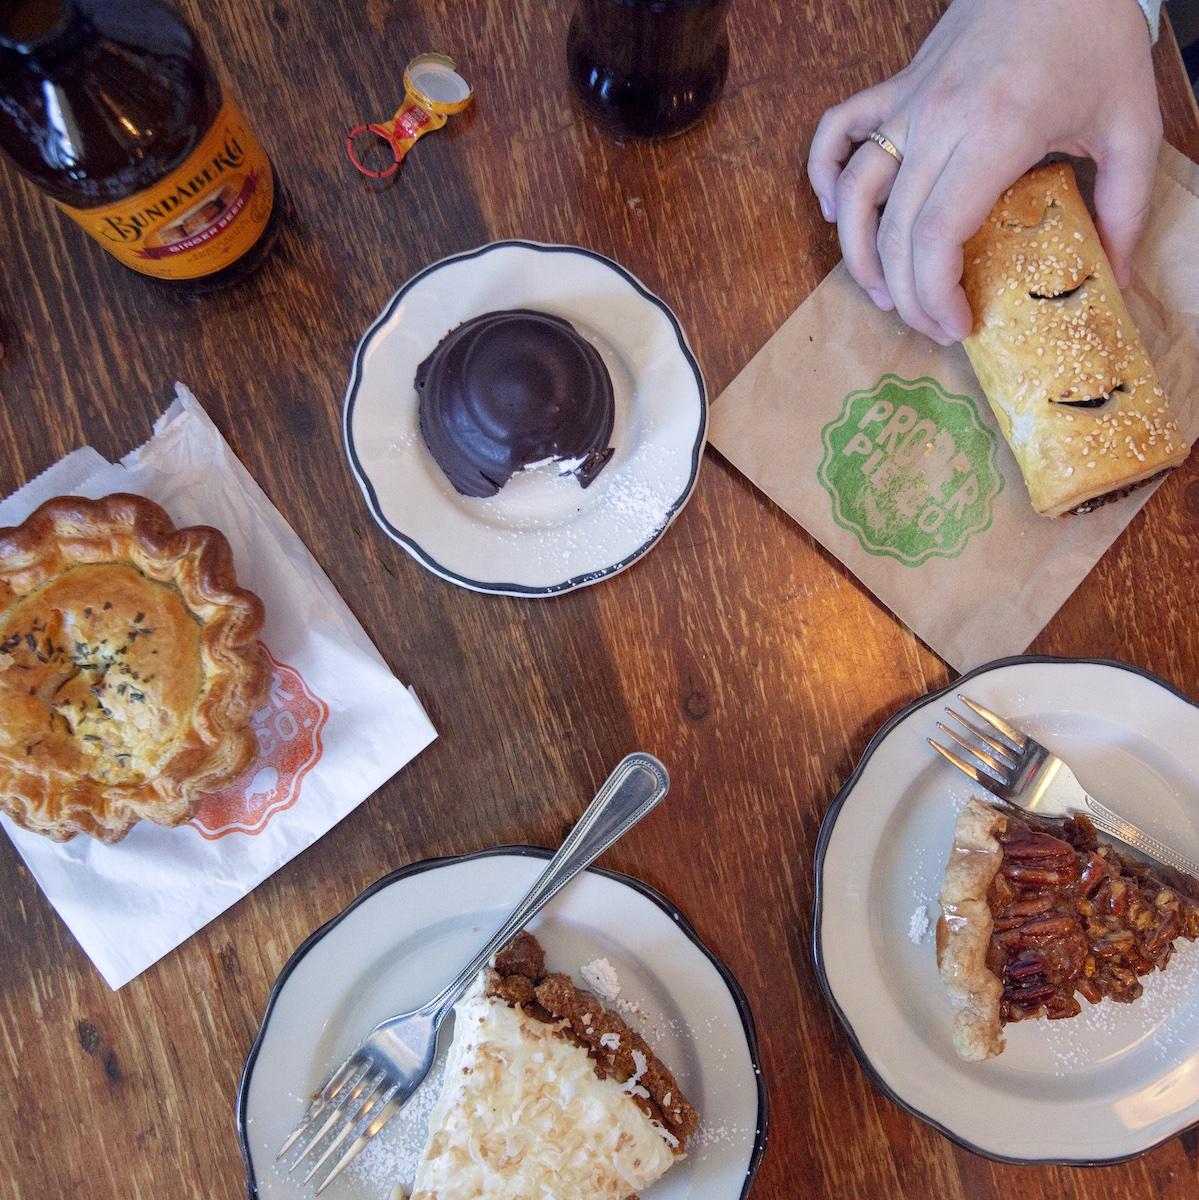 Meals at Proper Pie Co.